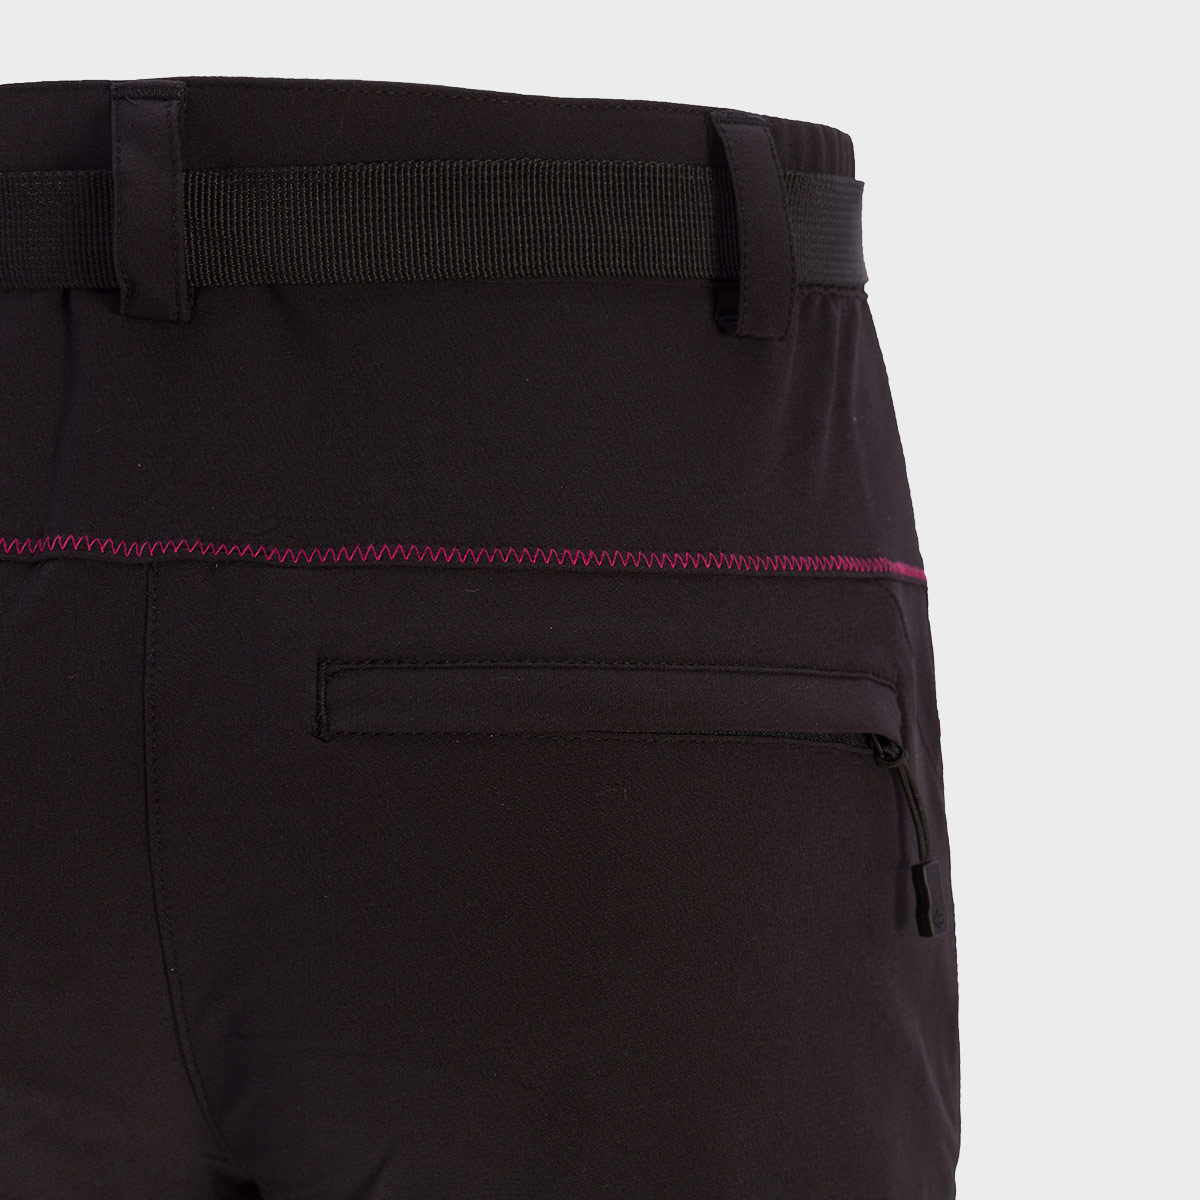 WOMAN'S ANCONA MOUNT STRETCH PANT BLACK